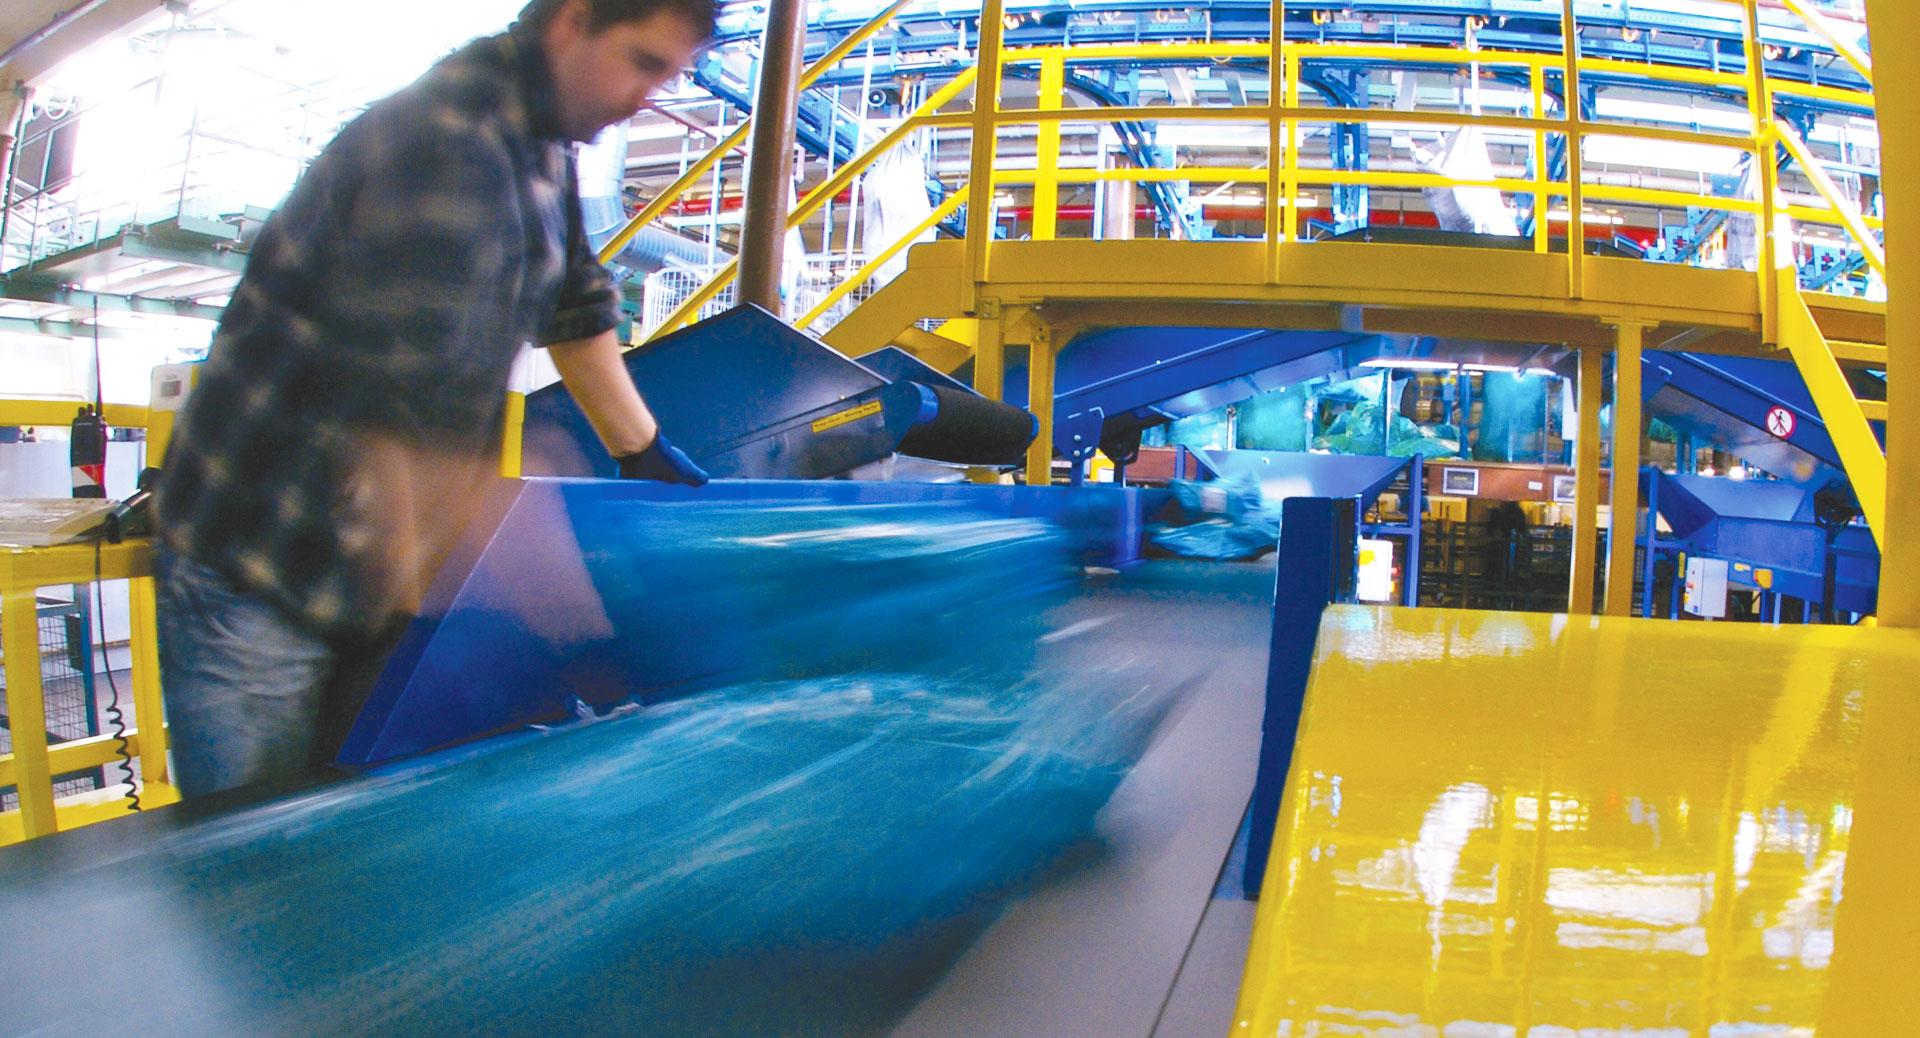 newland conveyors in warehouse